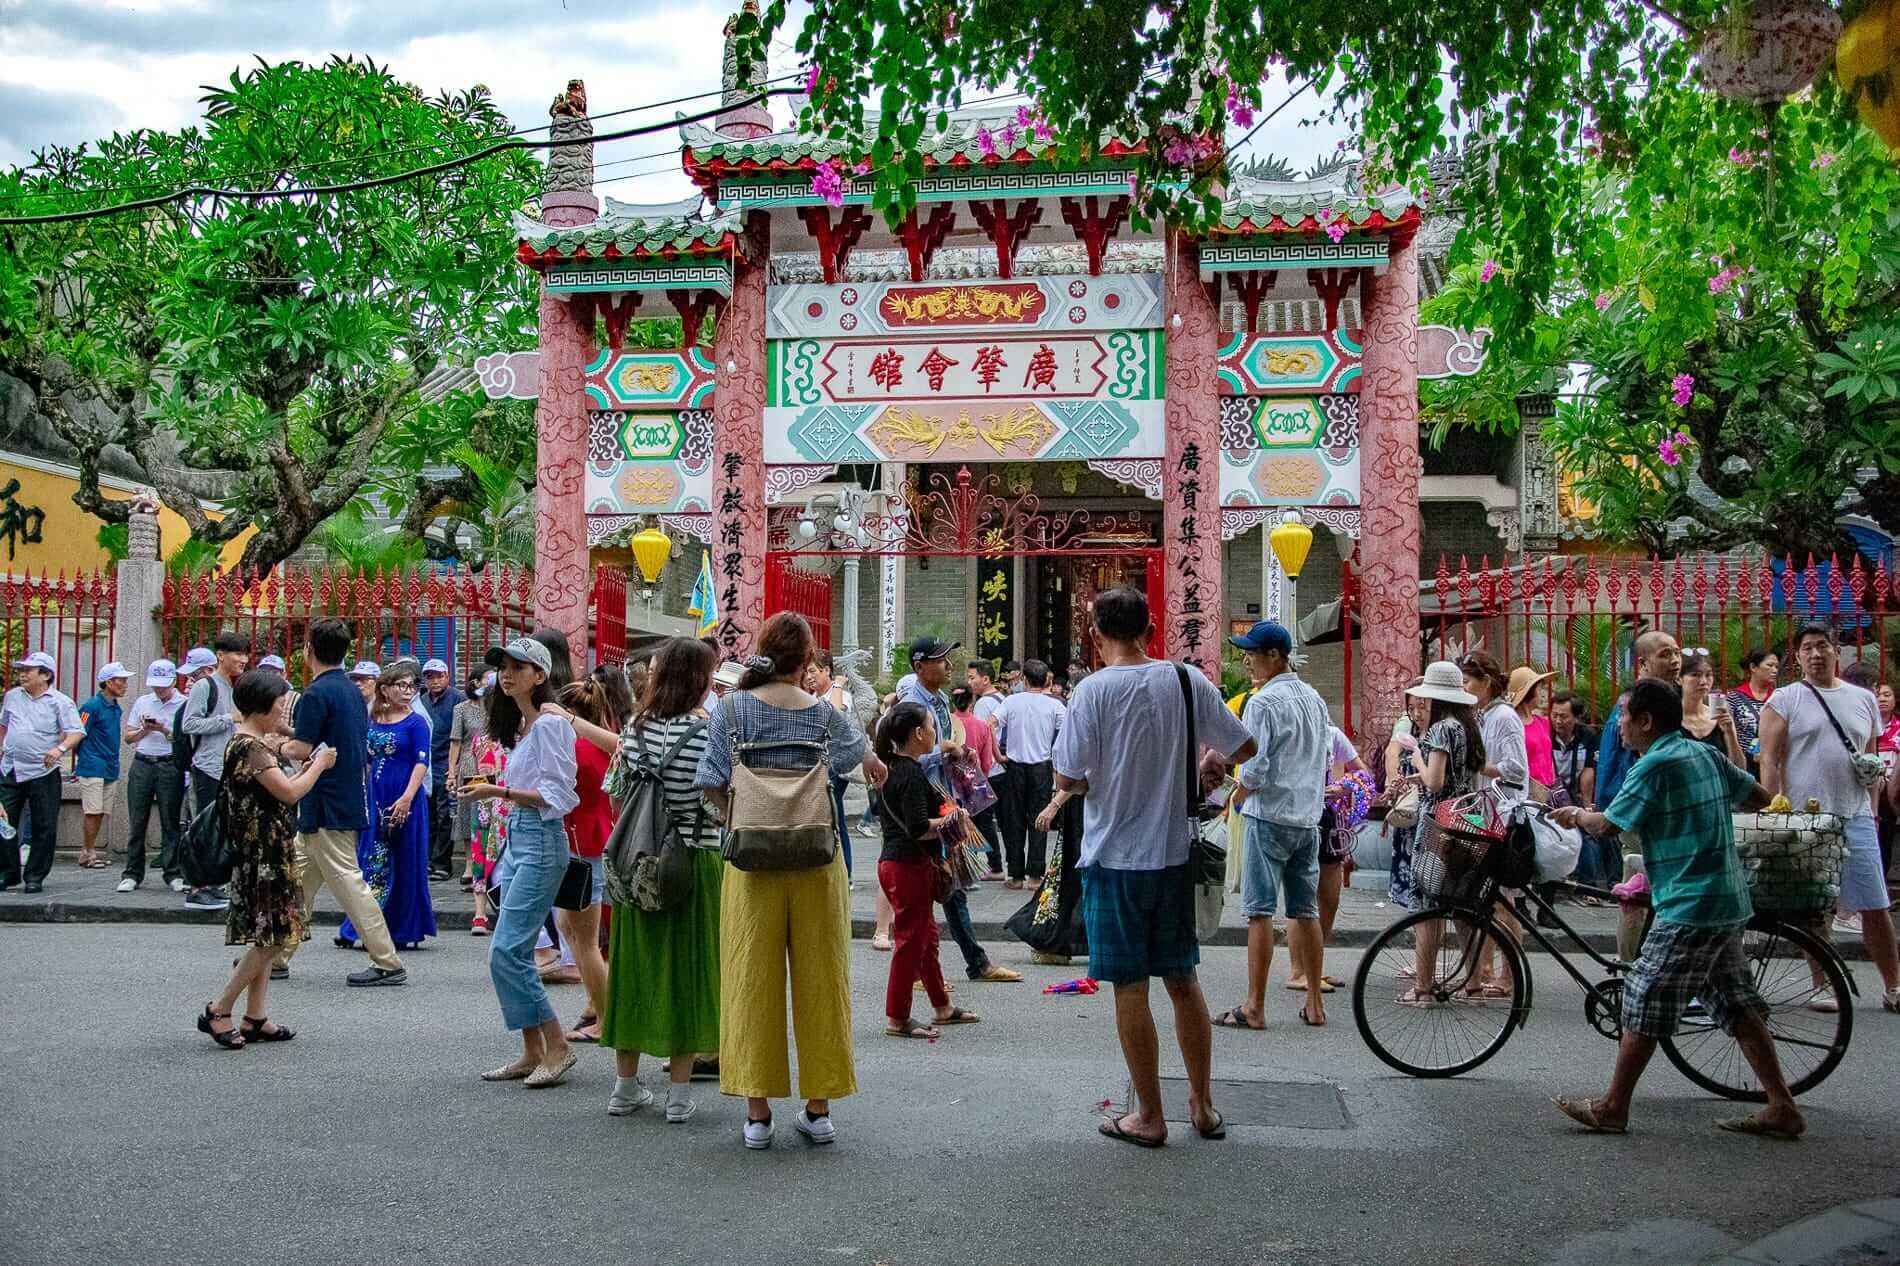 Tourists gather at the exterior of the Quang Trieu - Hoi An Ancient Town